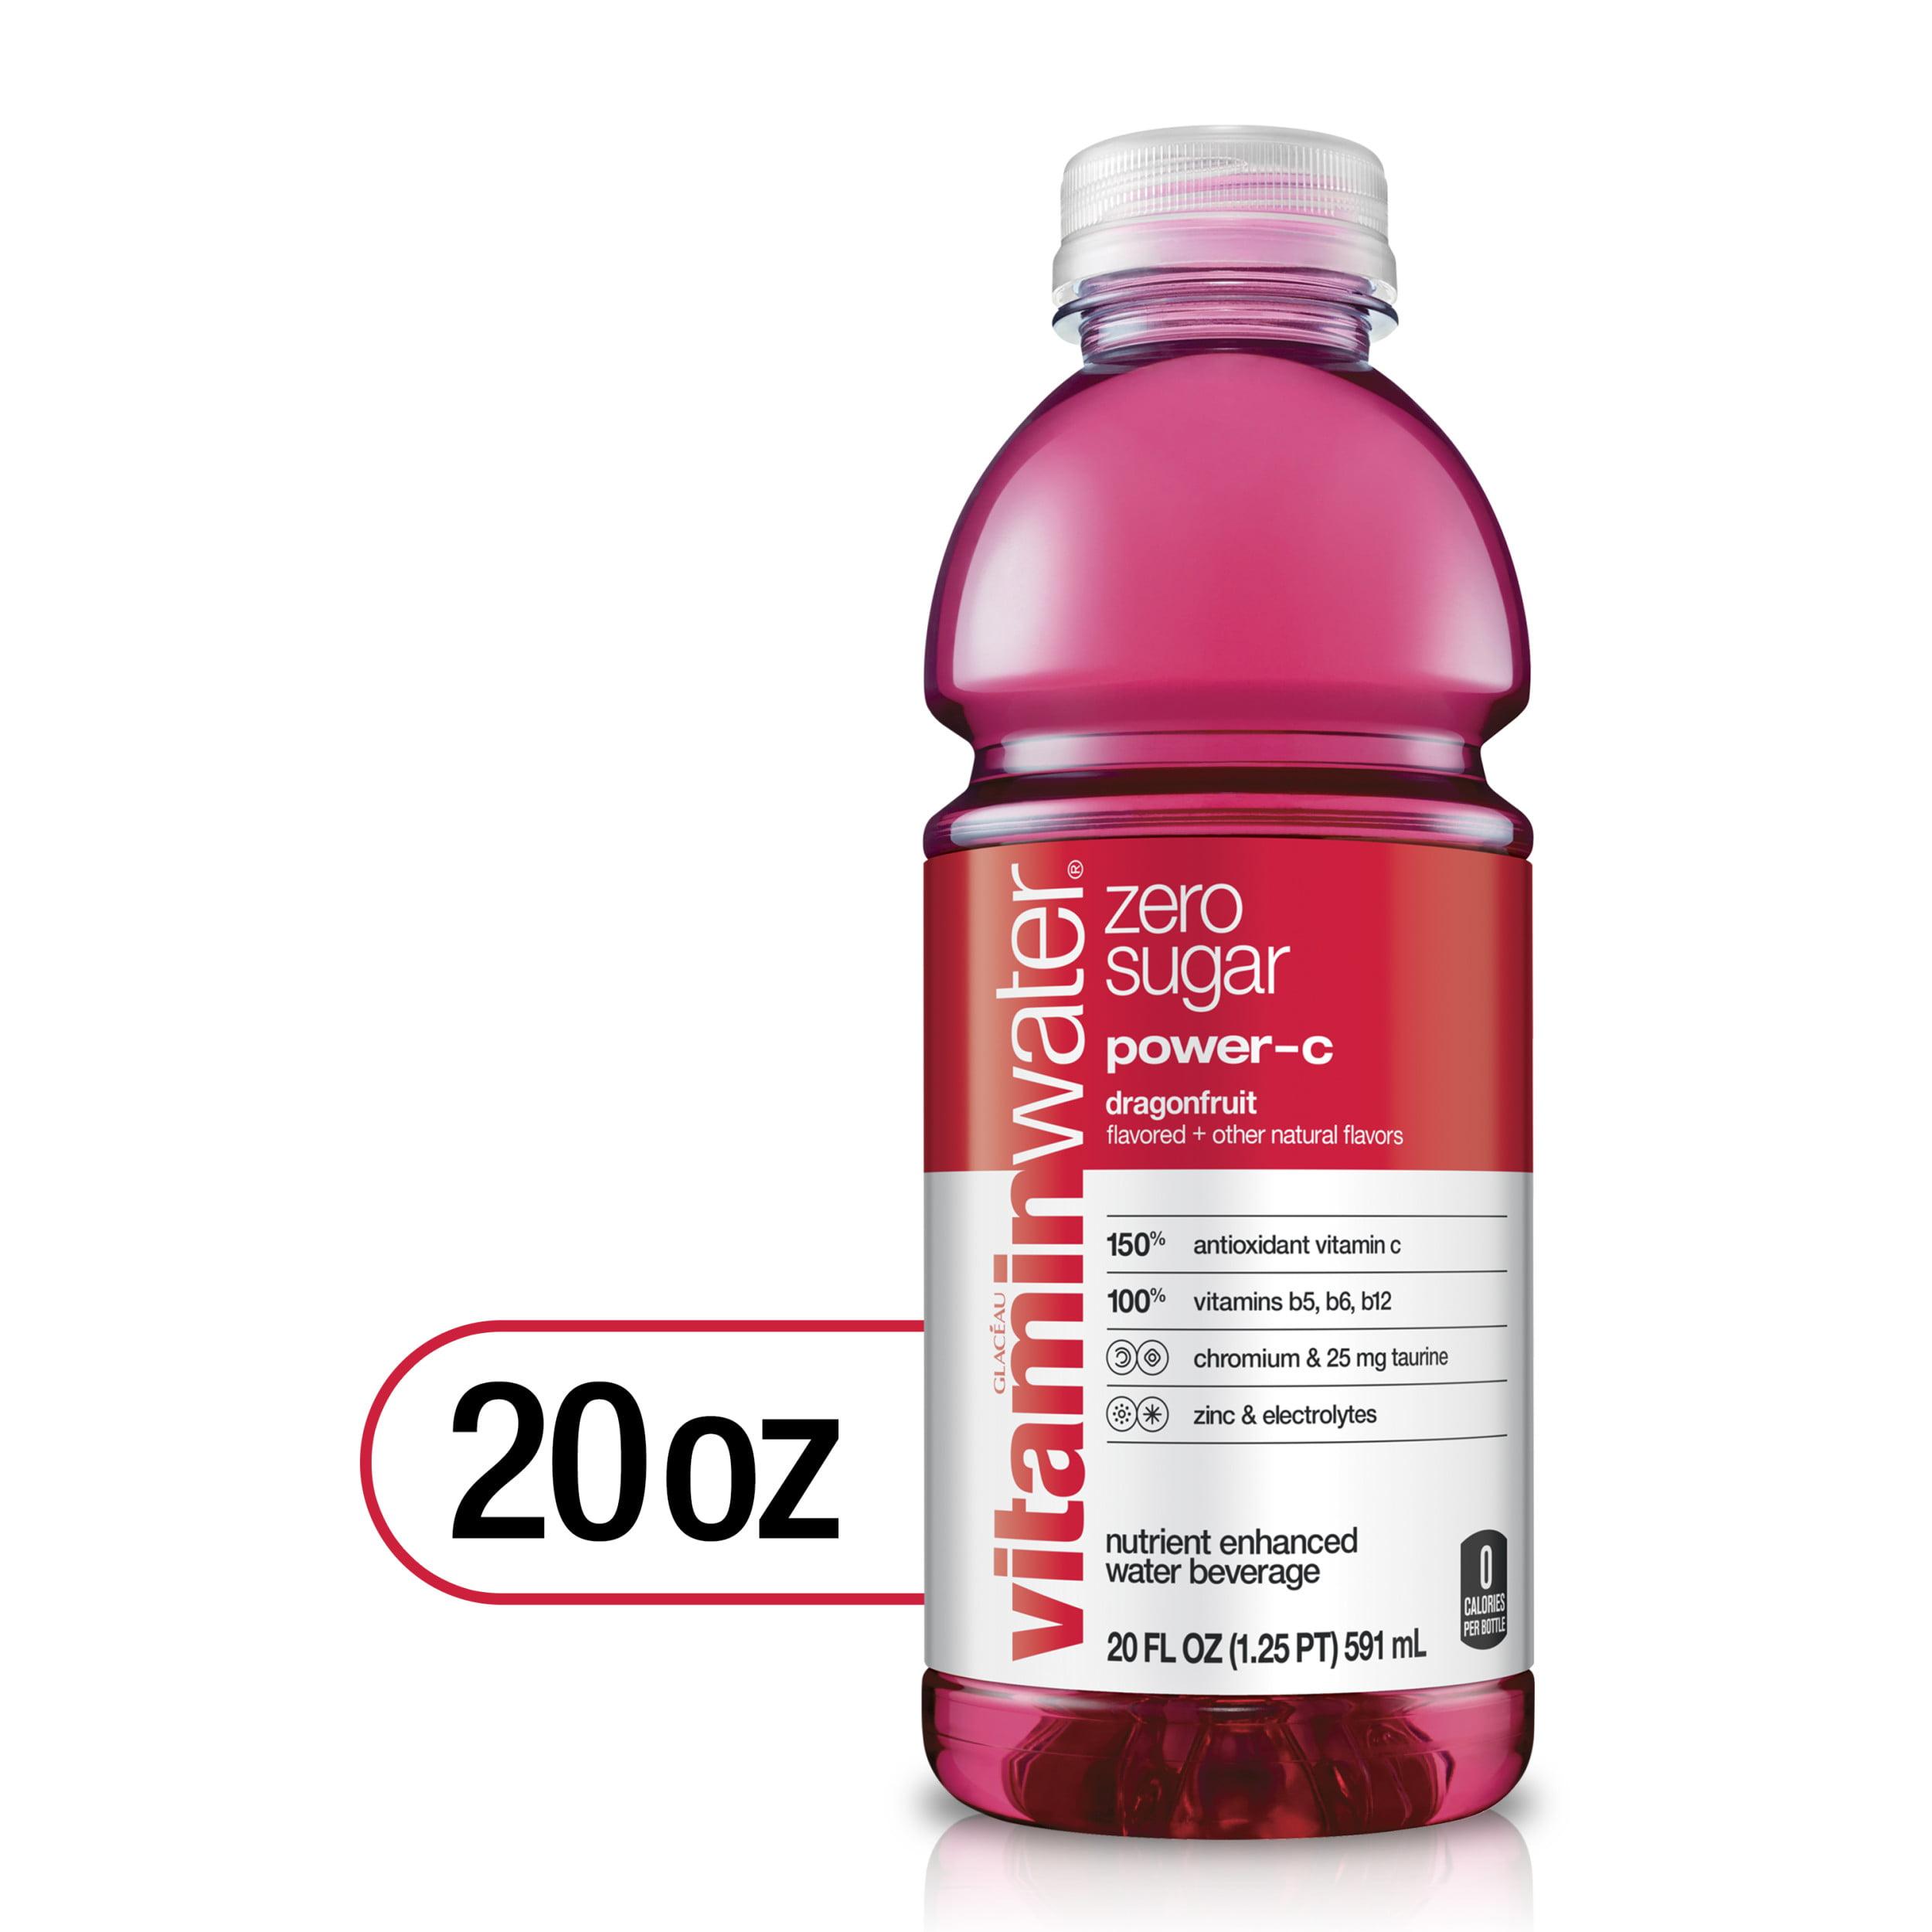 vitaminwater zero power c, electrolyte enhanced water w/ vitamins,  dragonfruit drink, 20 fl oz - Walmart.com - Walmart.com